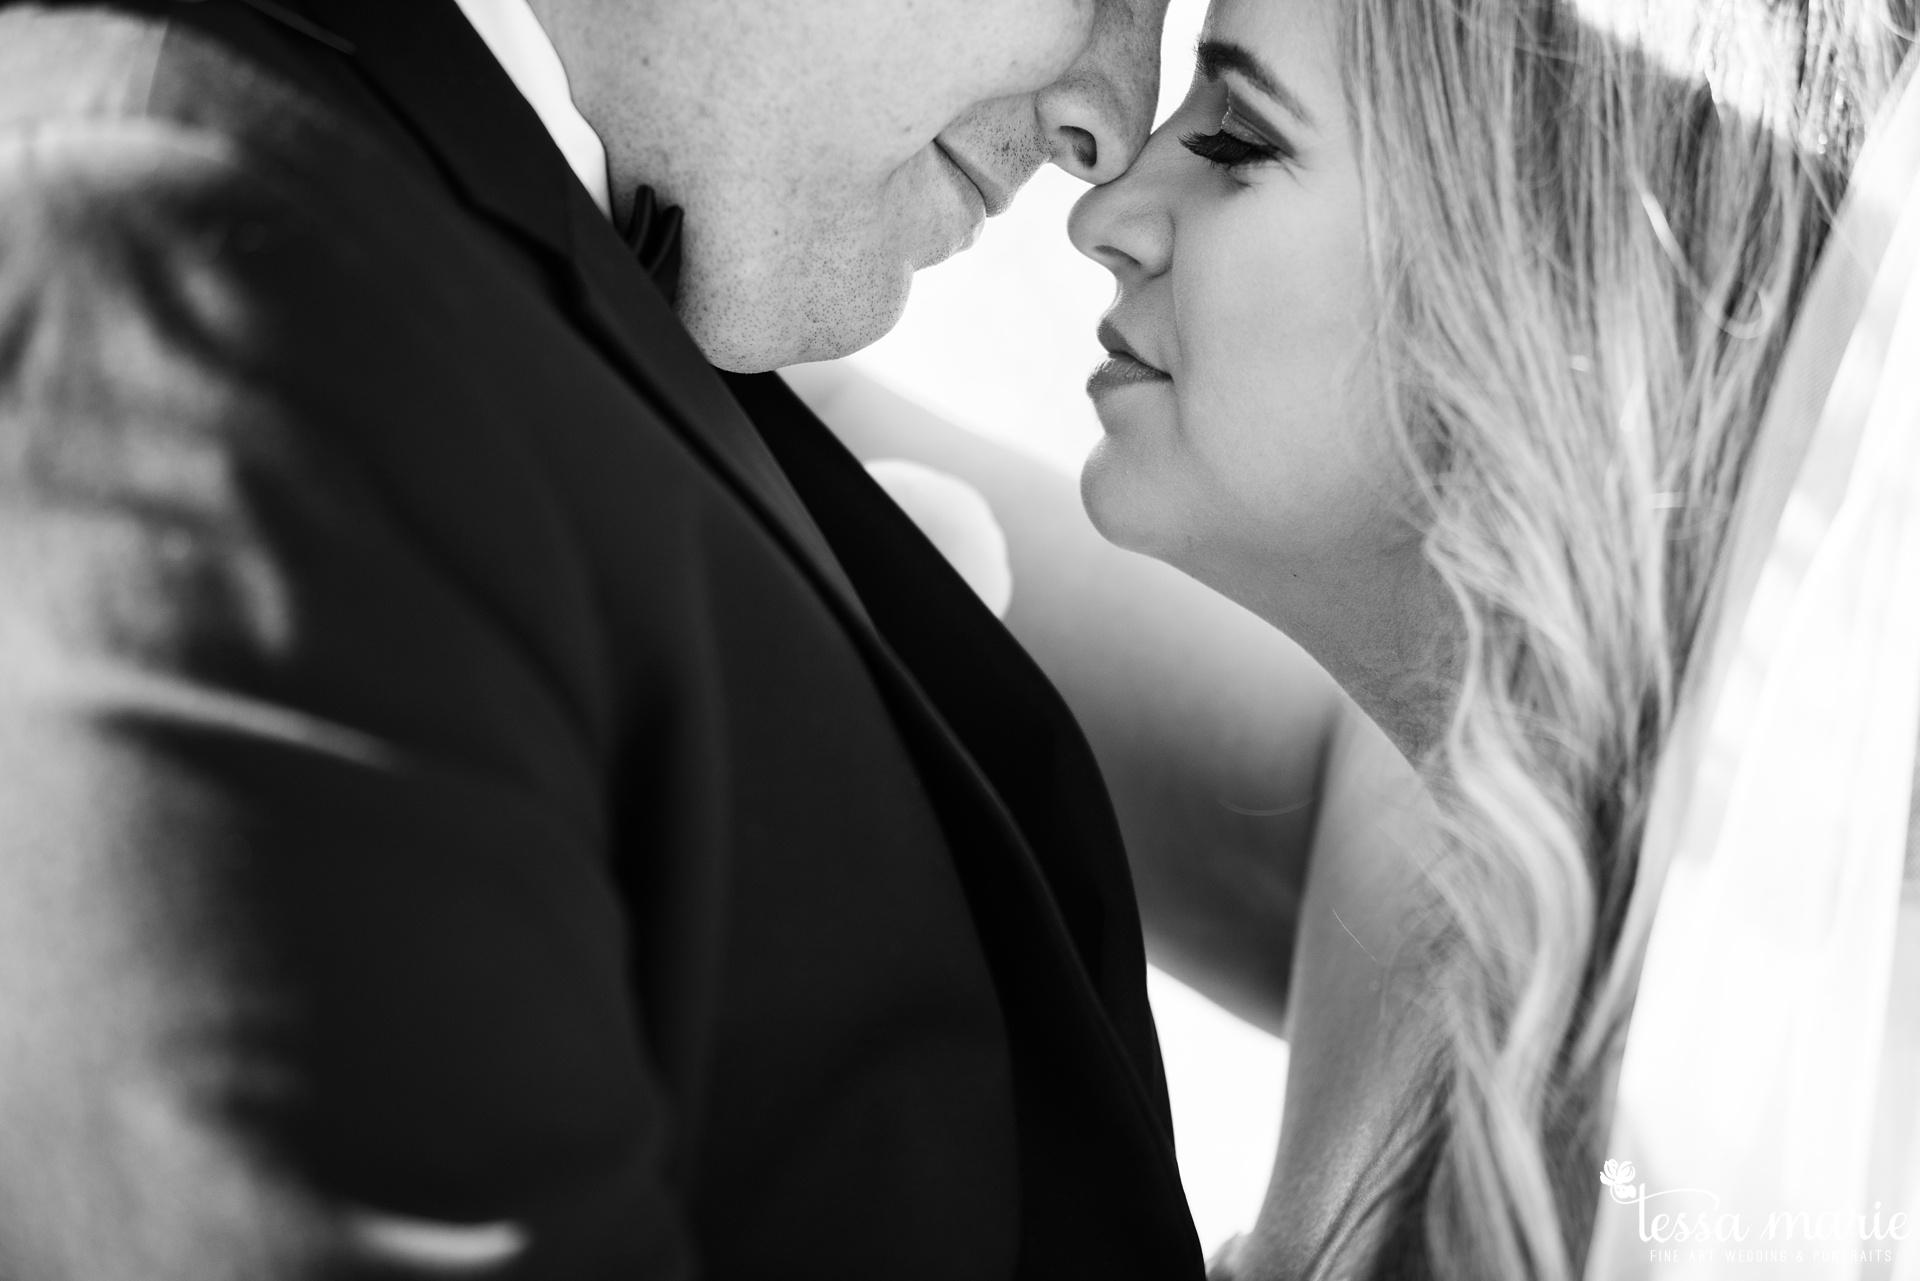 tessa_marie_legacy_moments_storytelling_candid_emotionally_driven_wedding_photographer_atlanta_wedding_photography_st_ives_country_club_wedding_boukates_bridals_by_lori_0017